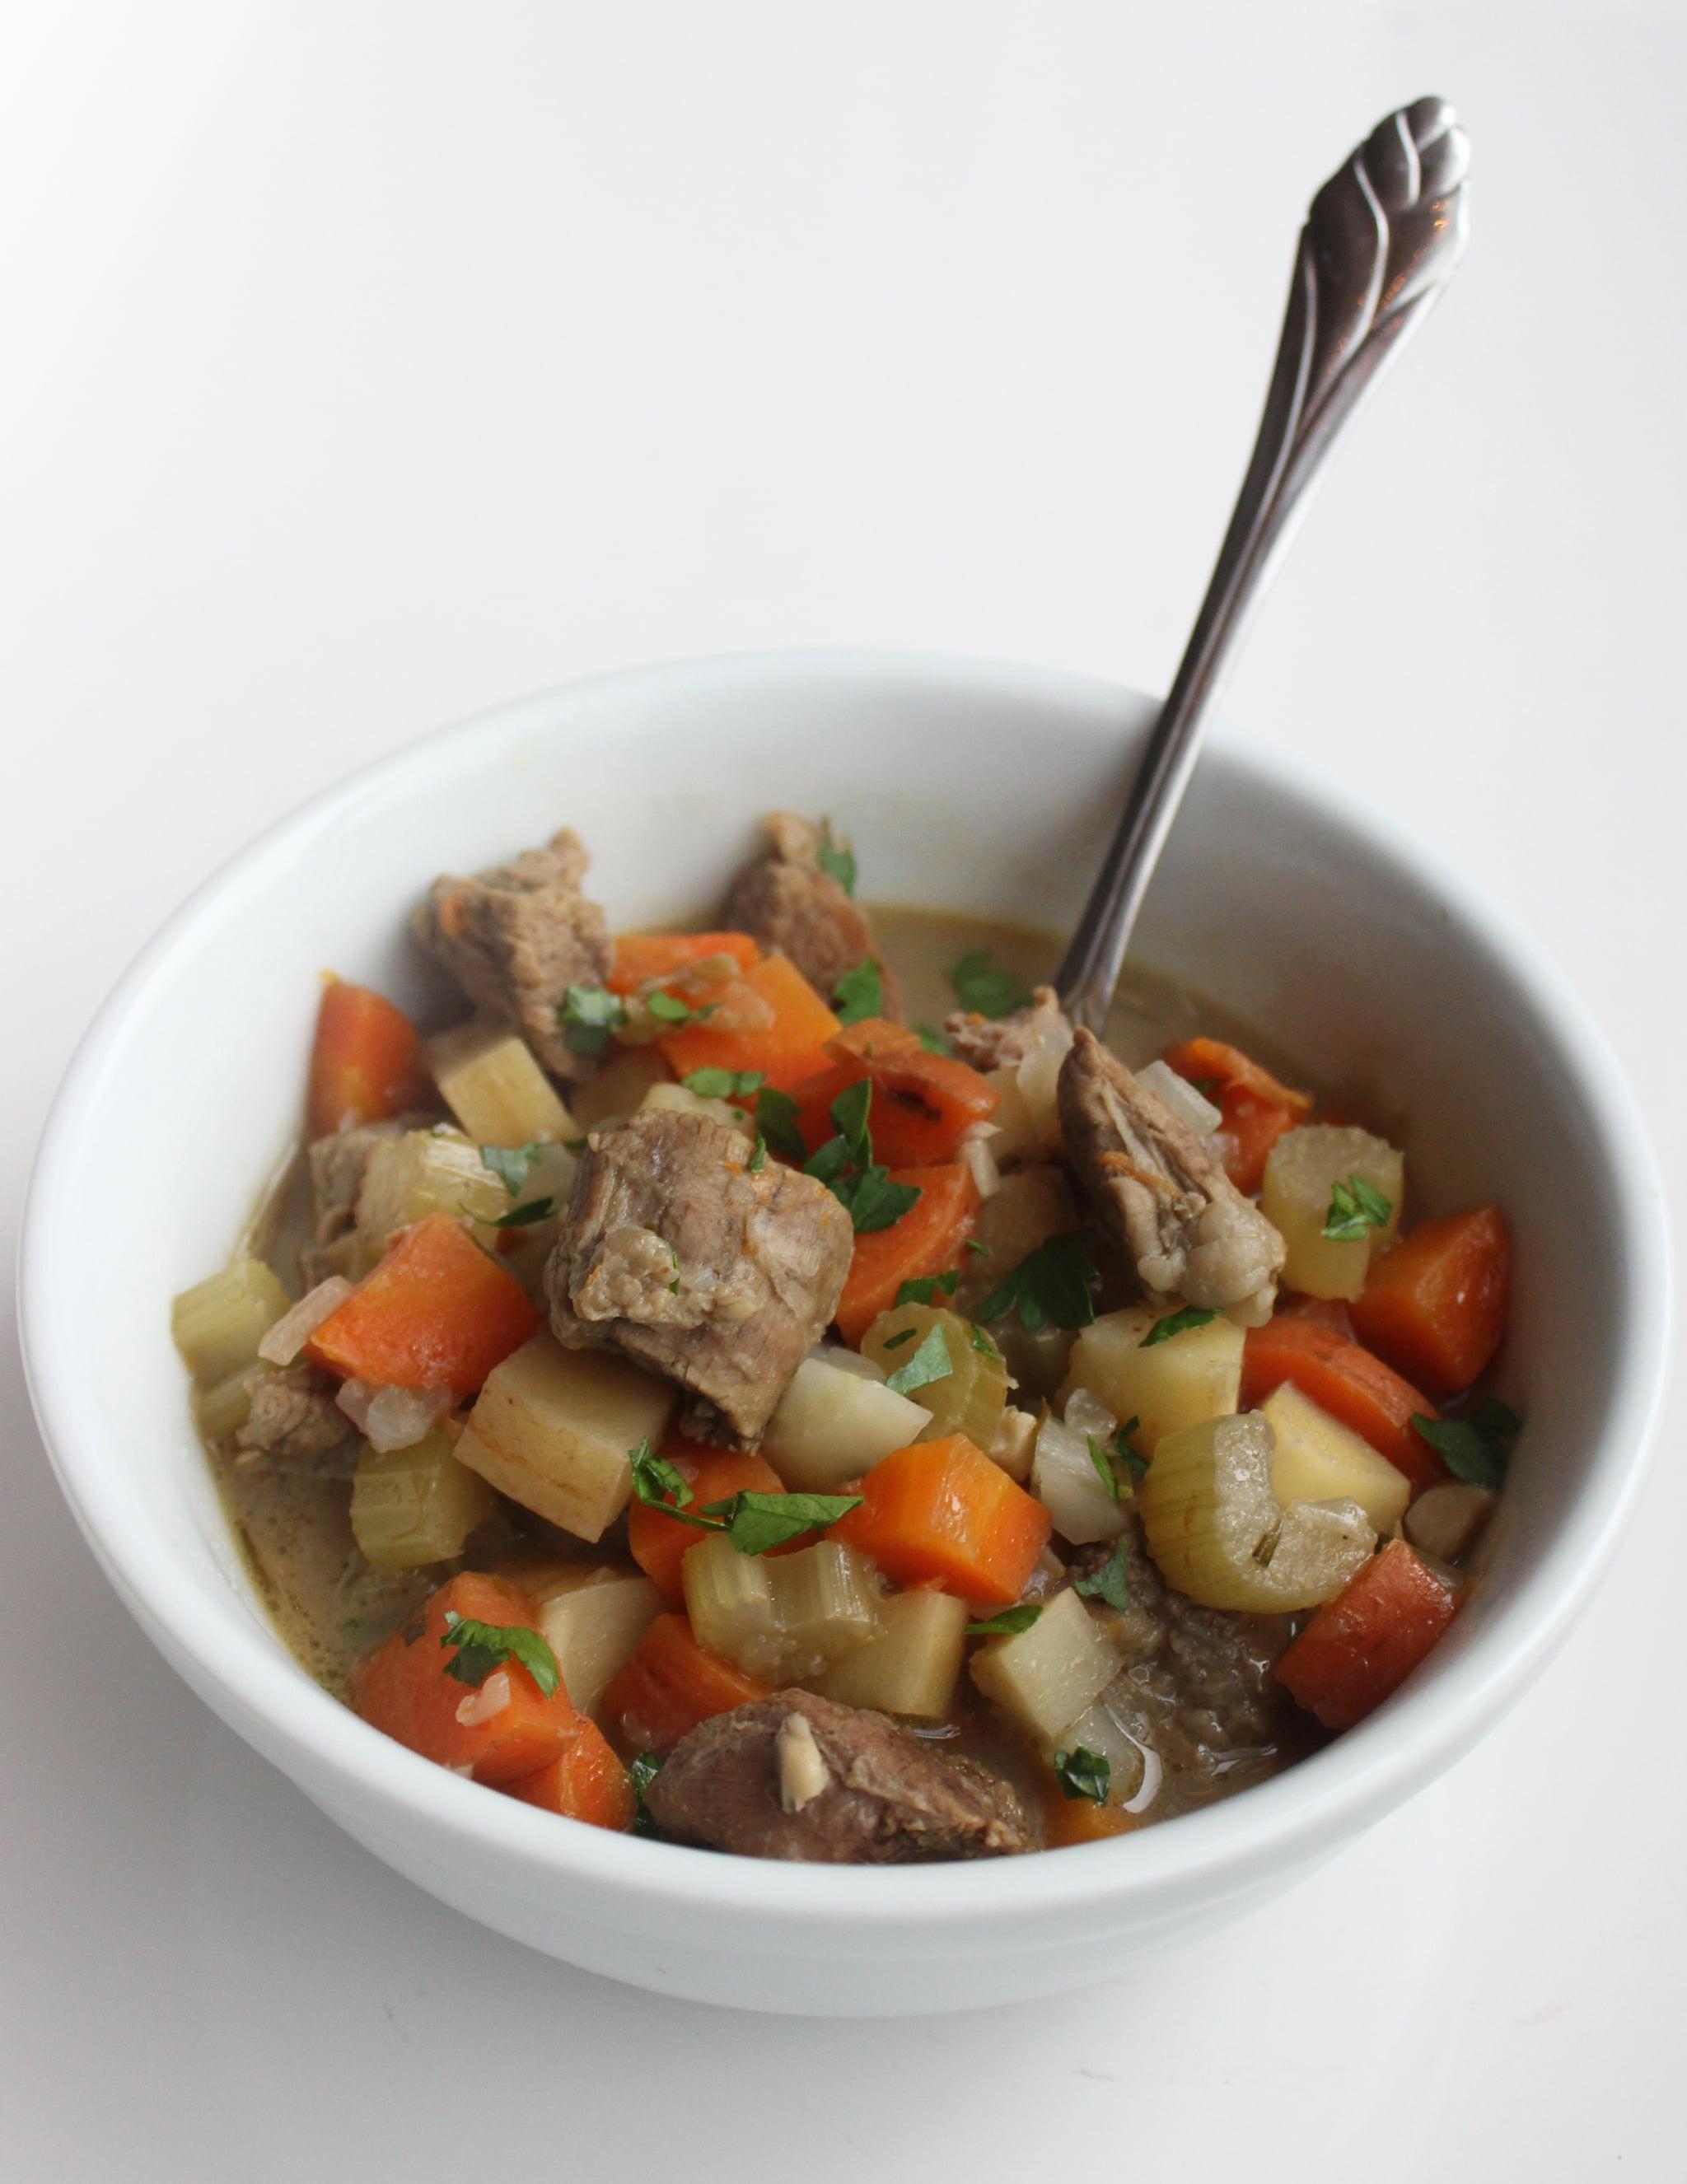 Healthy Beef Stew Recipe Slow Cooker  Healthy Beef Stew